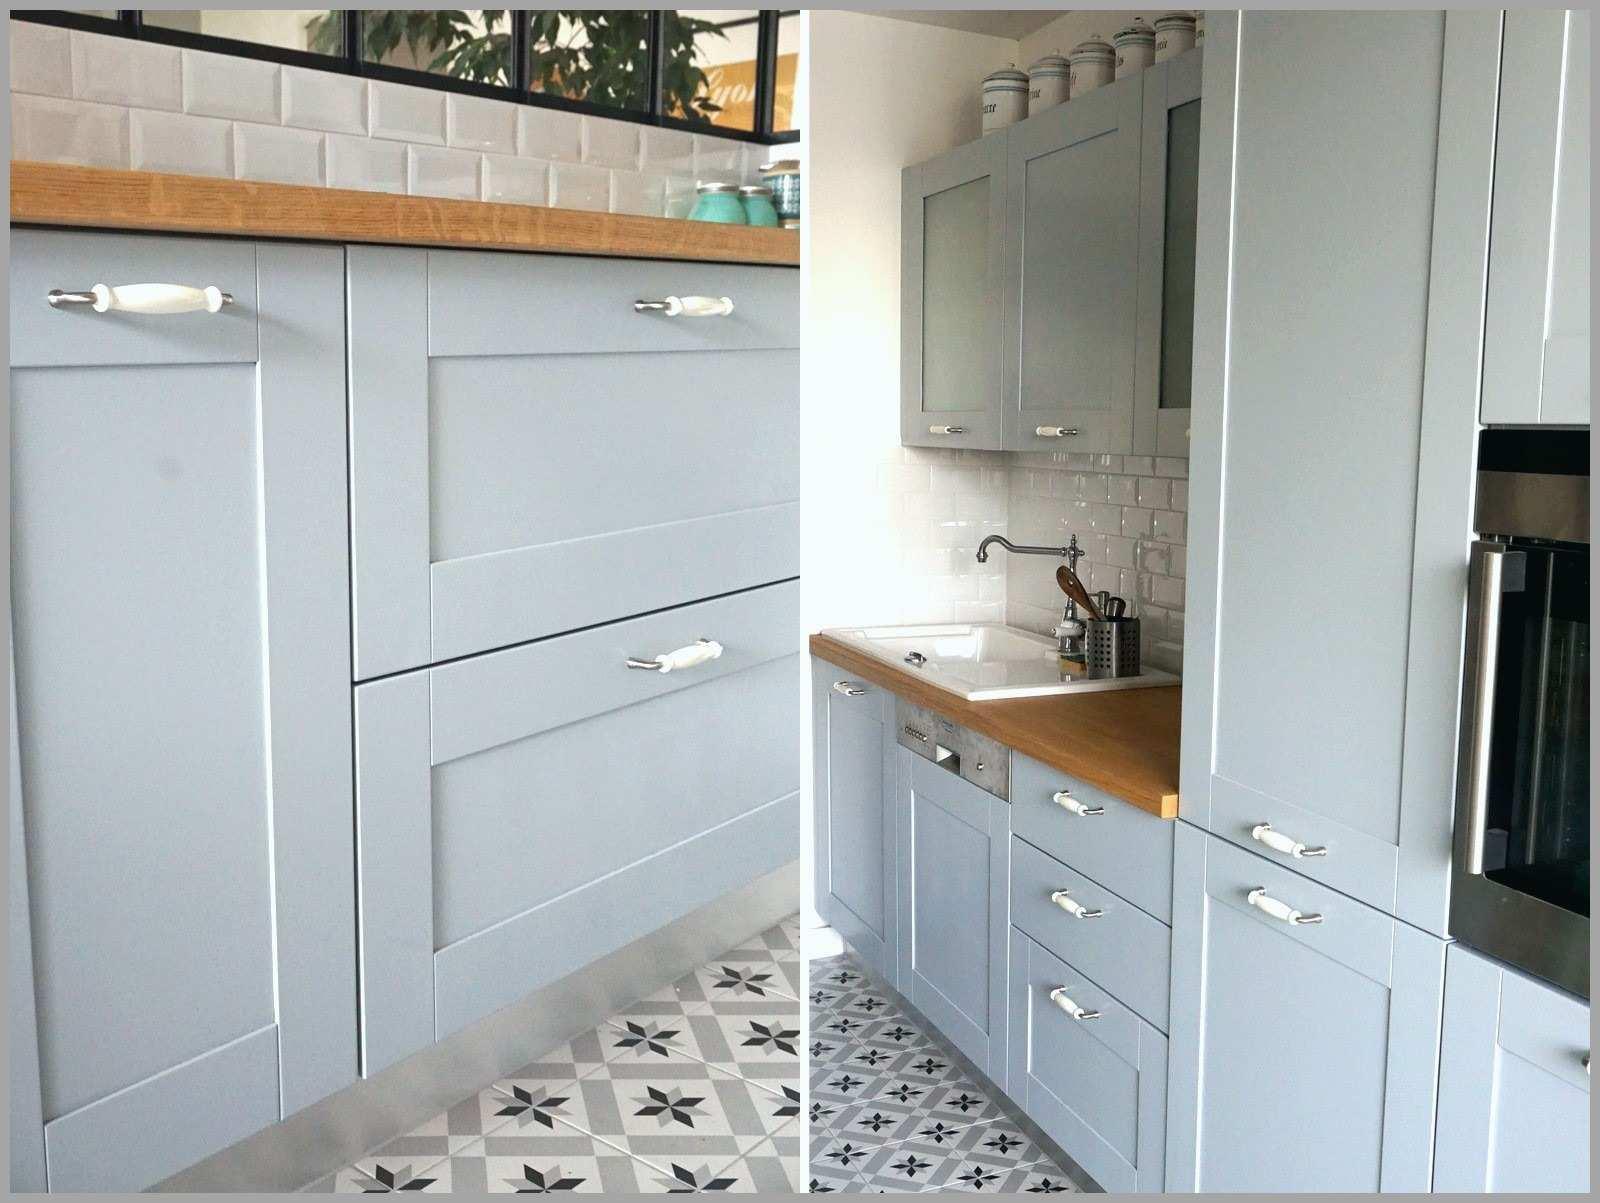 Peindre meuble de cuisine ikea Livreetvin fr